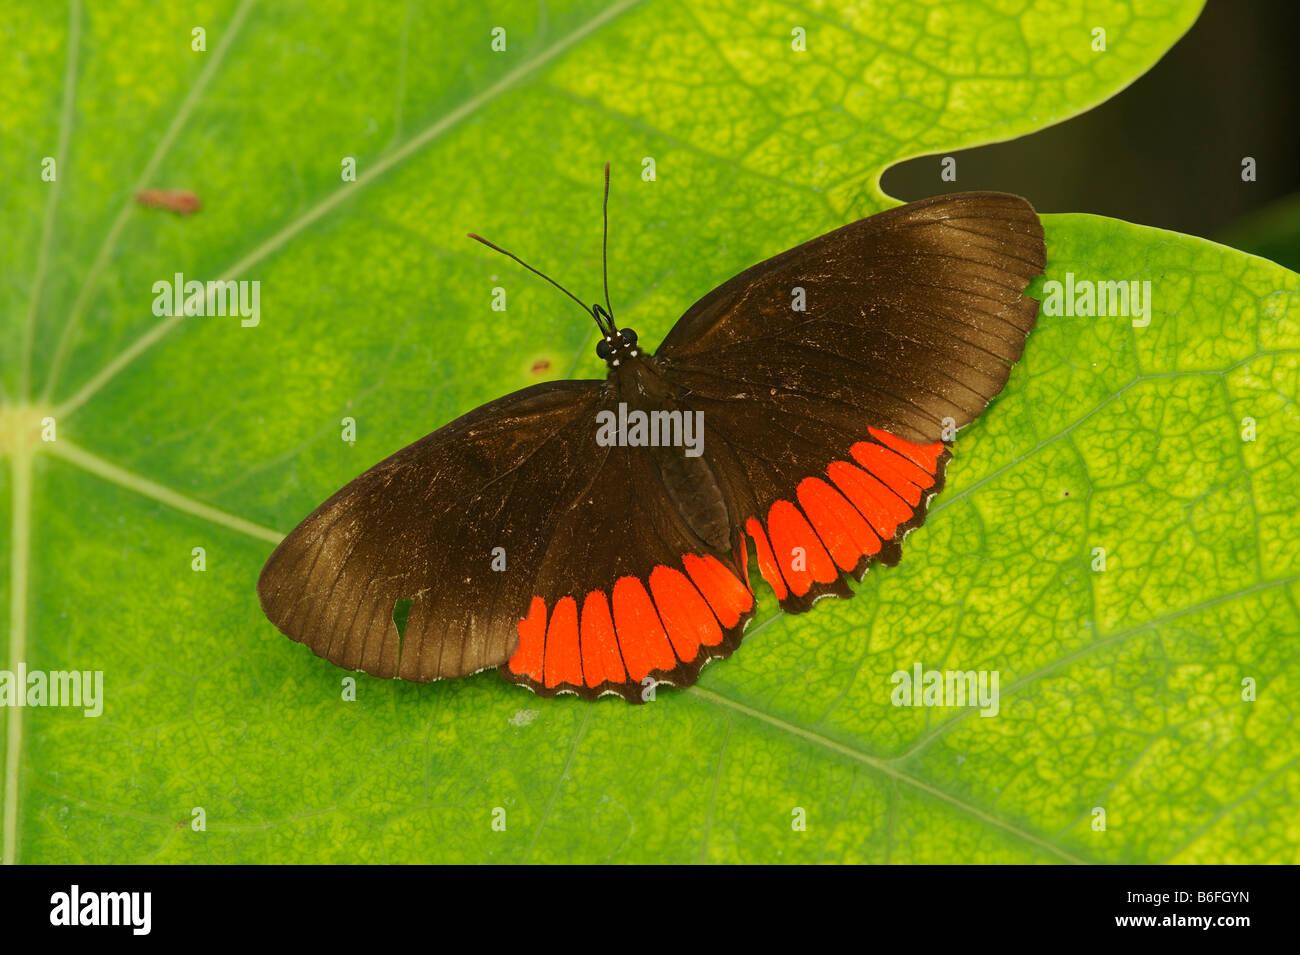 Tropical Butterfly, Ecuador, South America - Stock Image